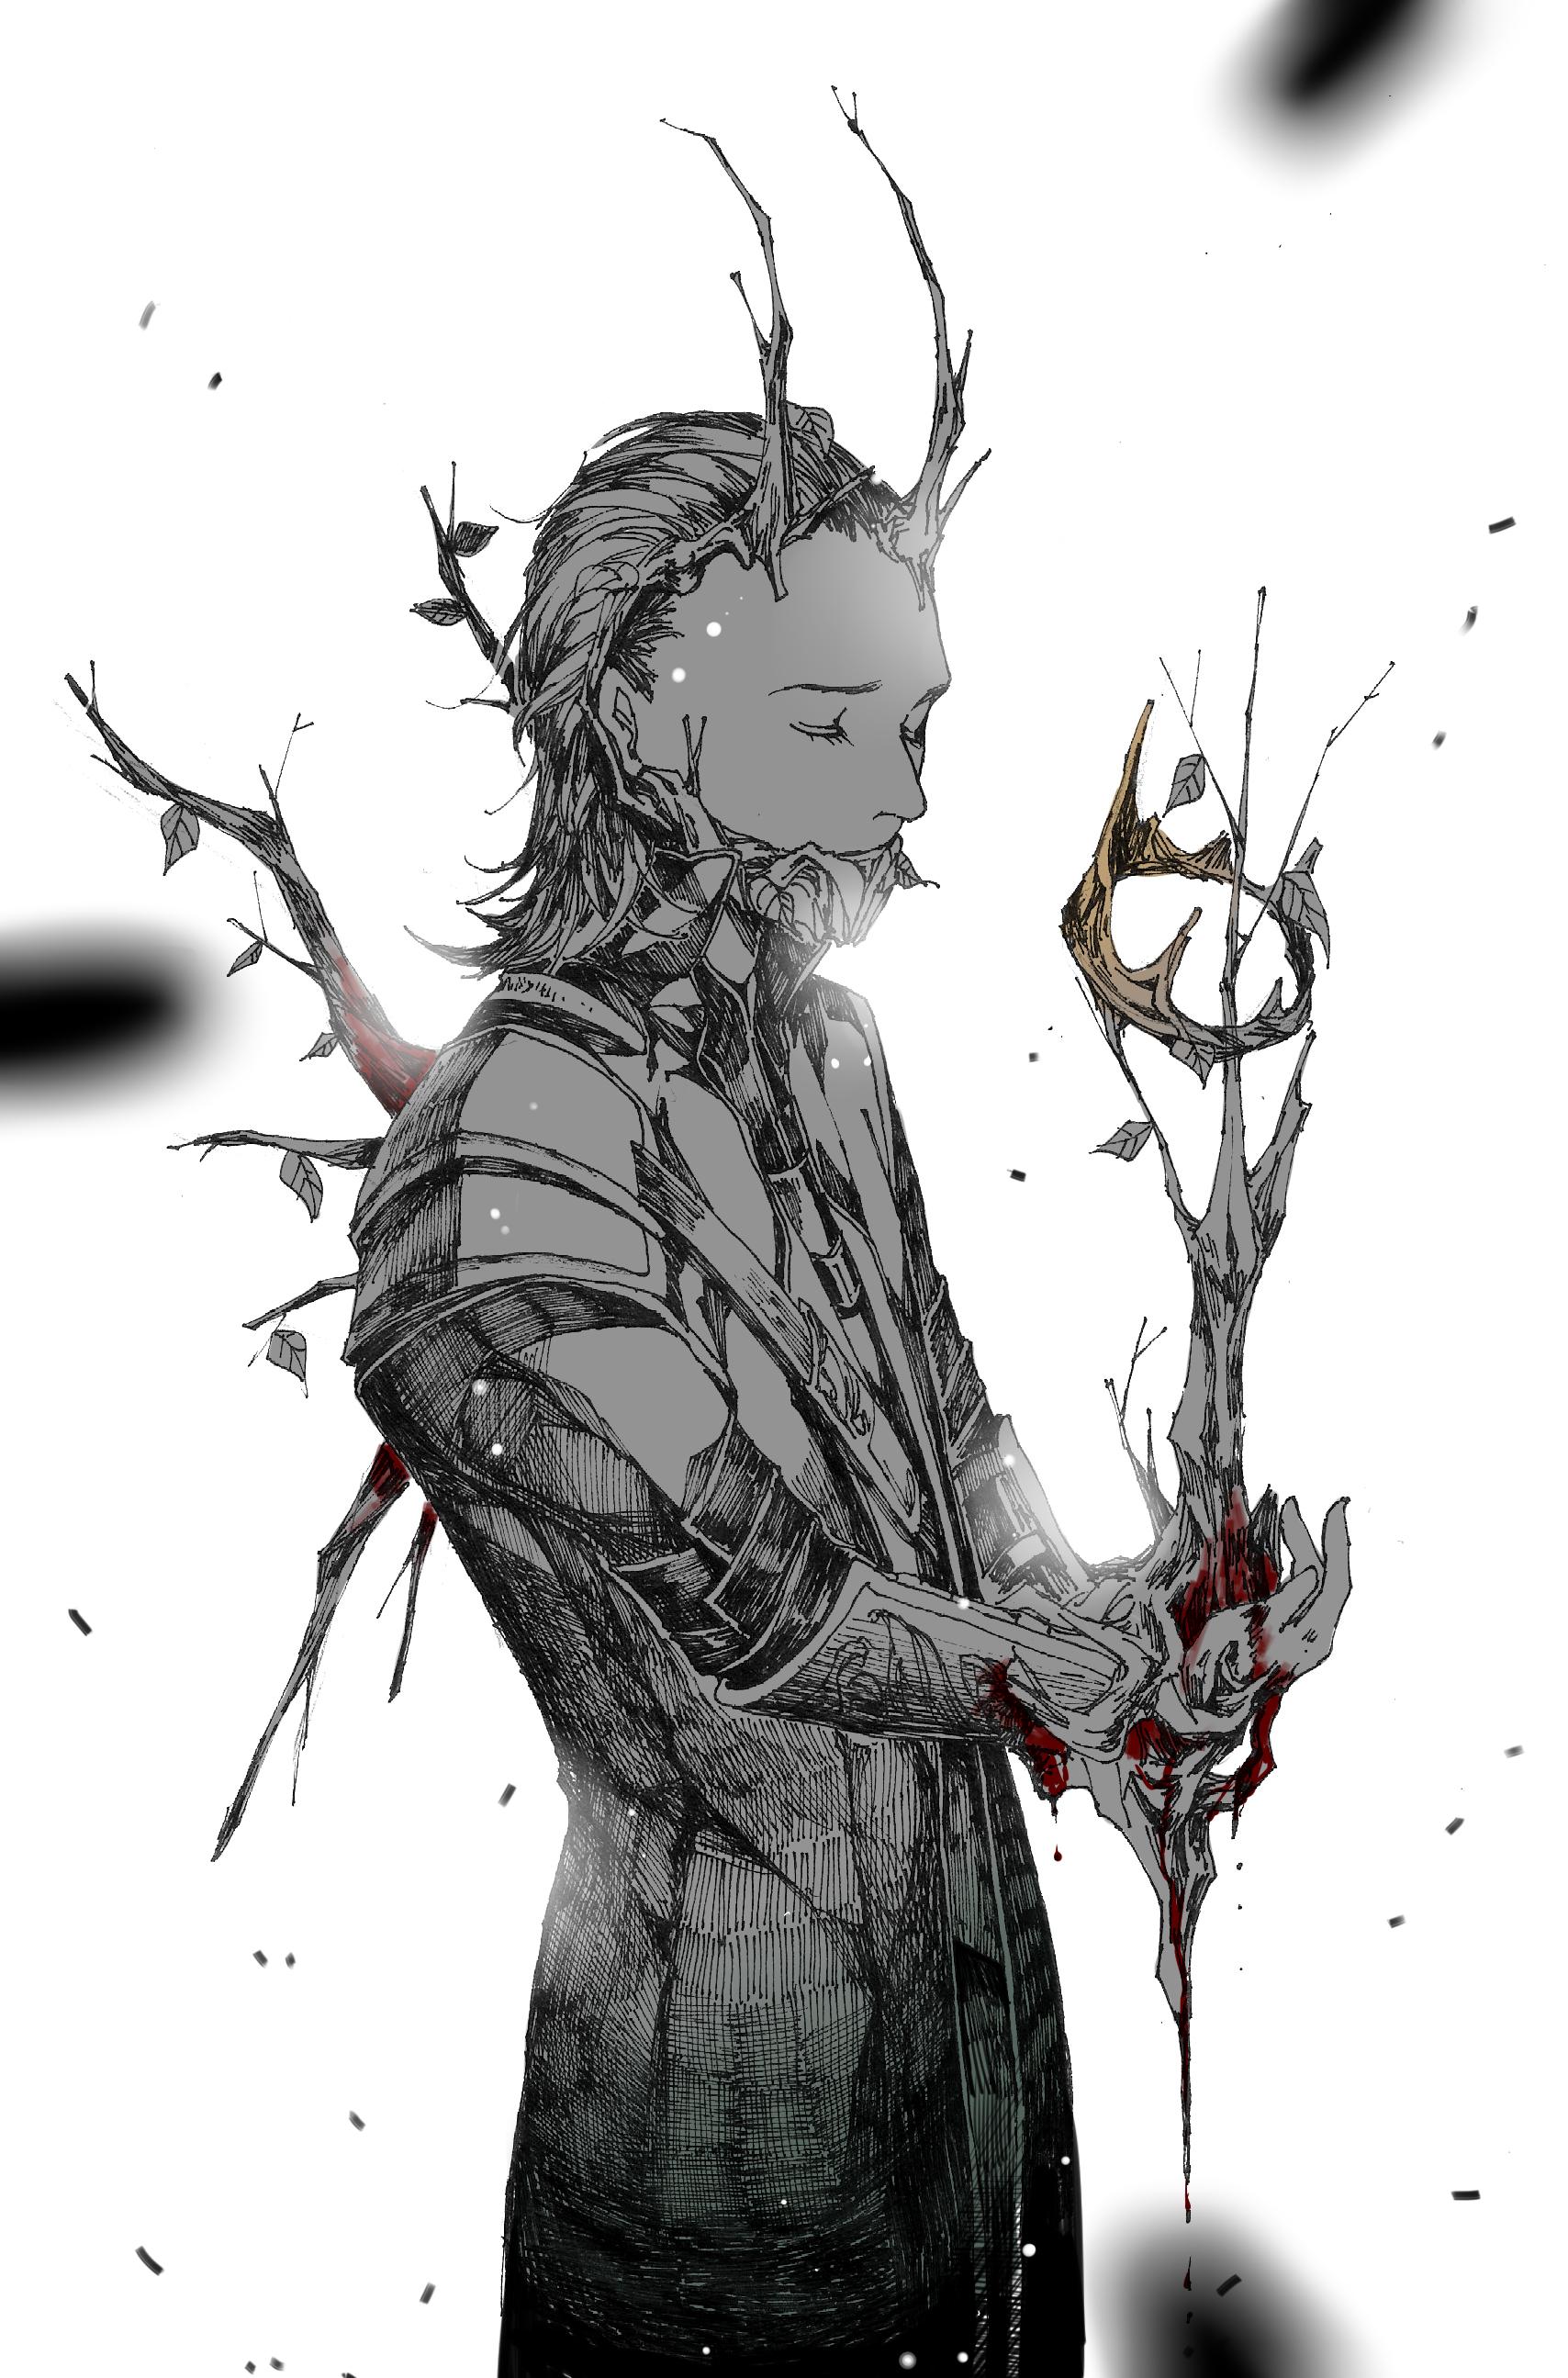 Thor (Film) - Marvel - Zerochan Anime Image Board